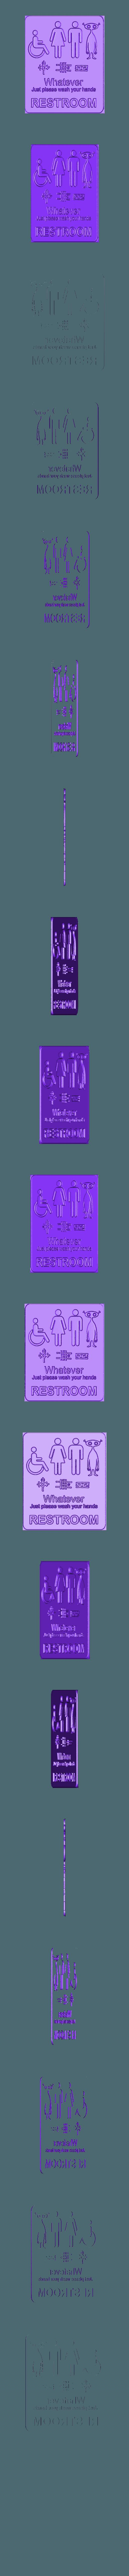 Restroom.stl Download free STL file Restroom Signage • 3D printable template, Account-Closed